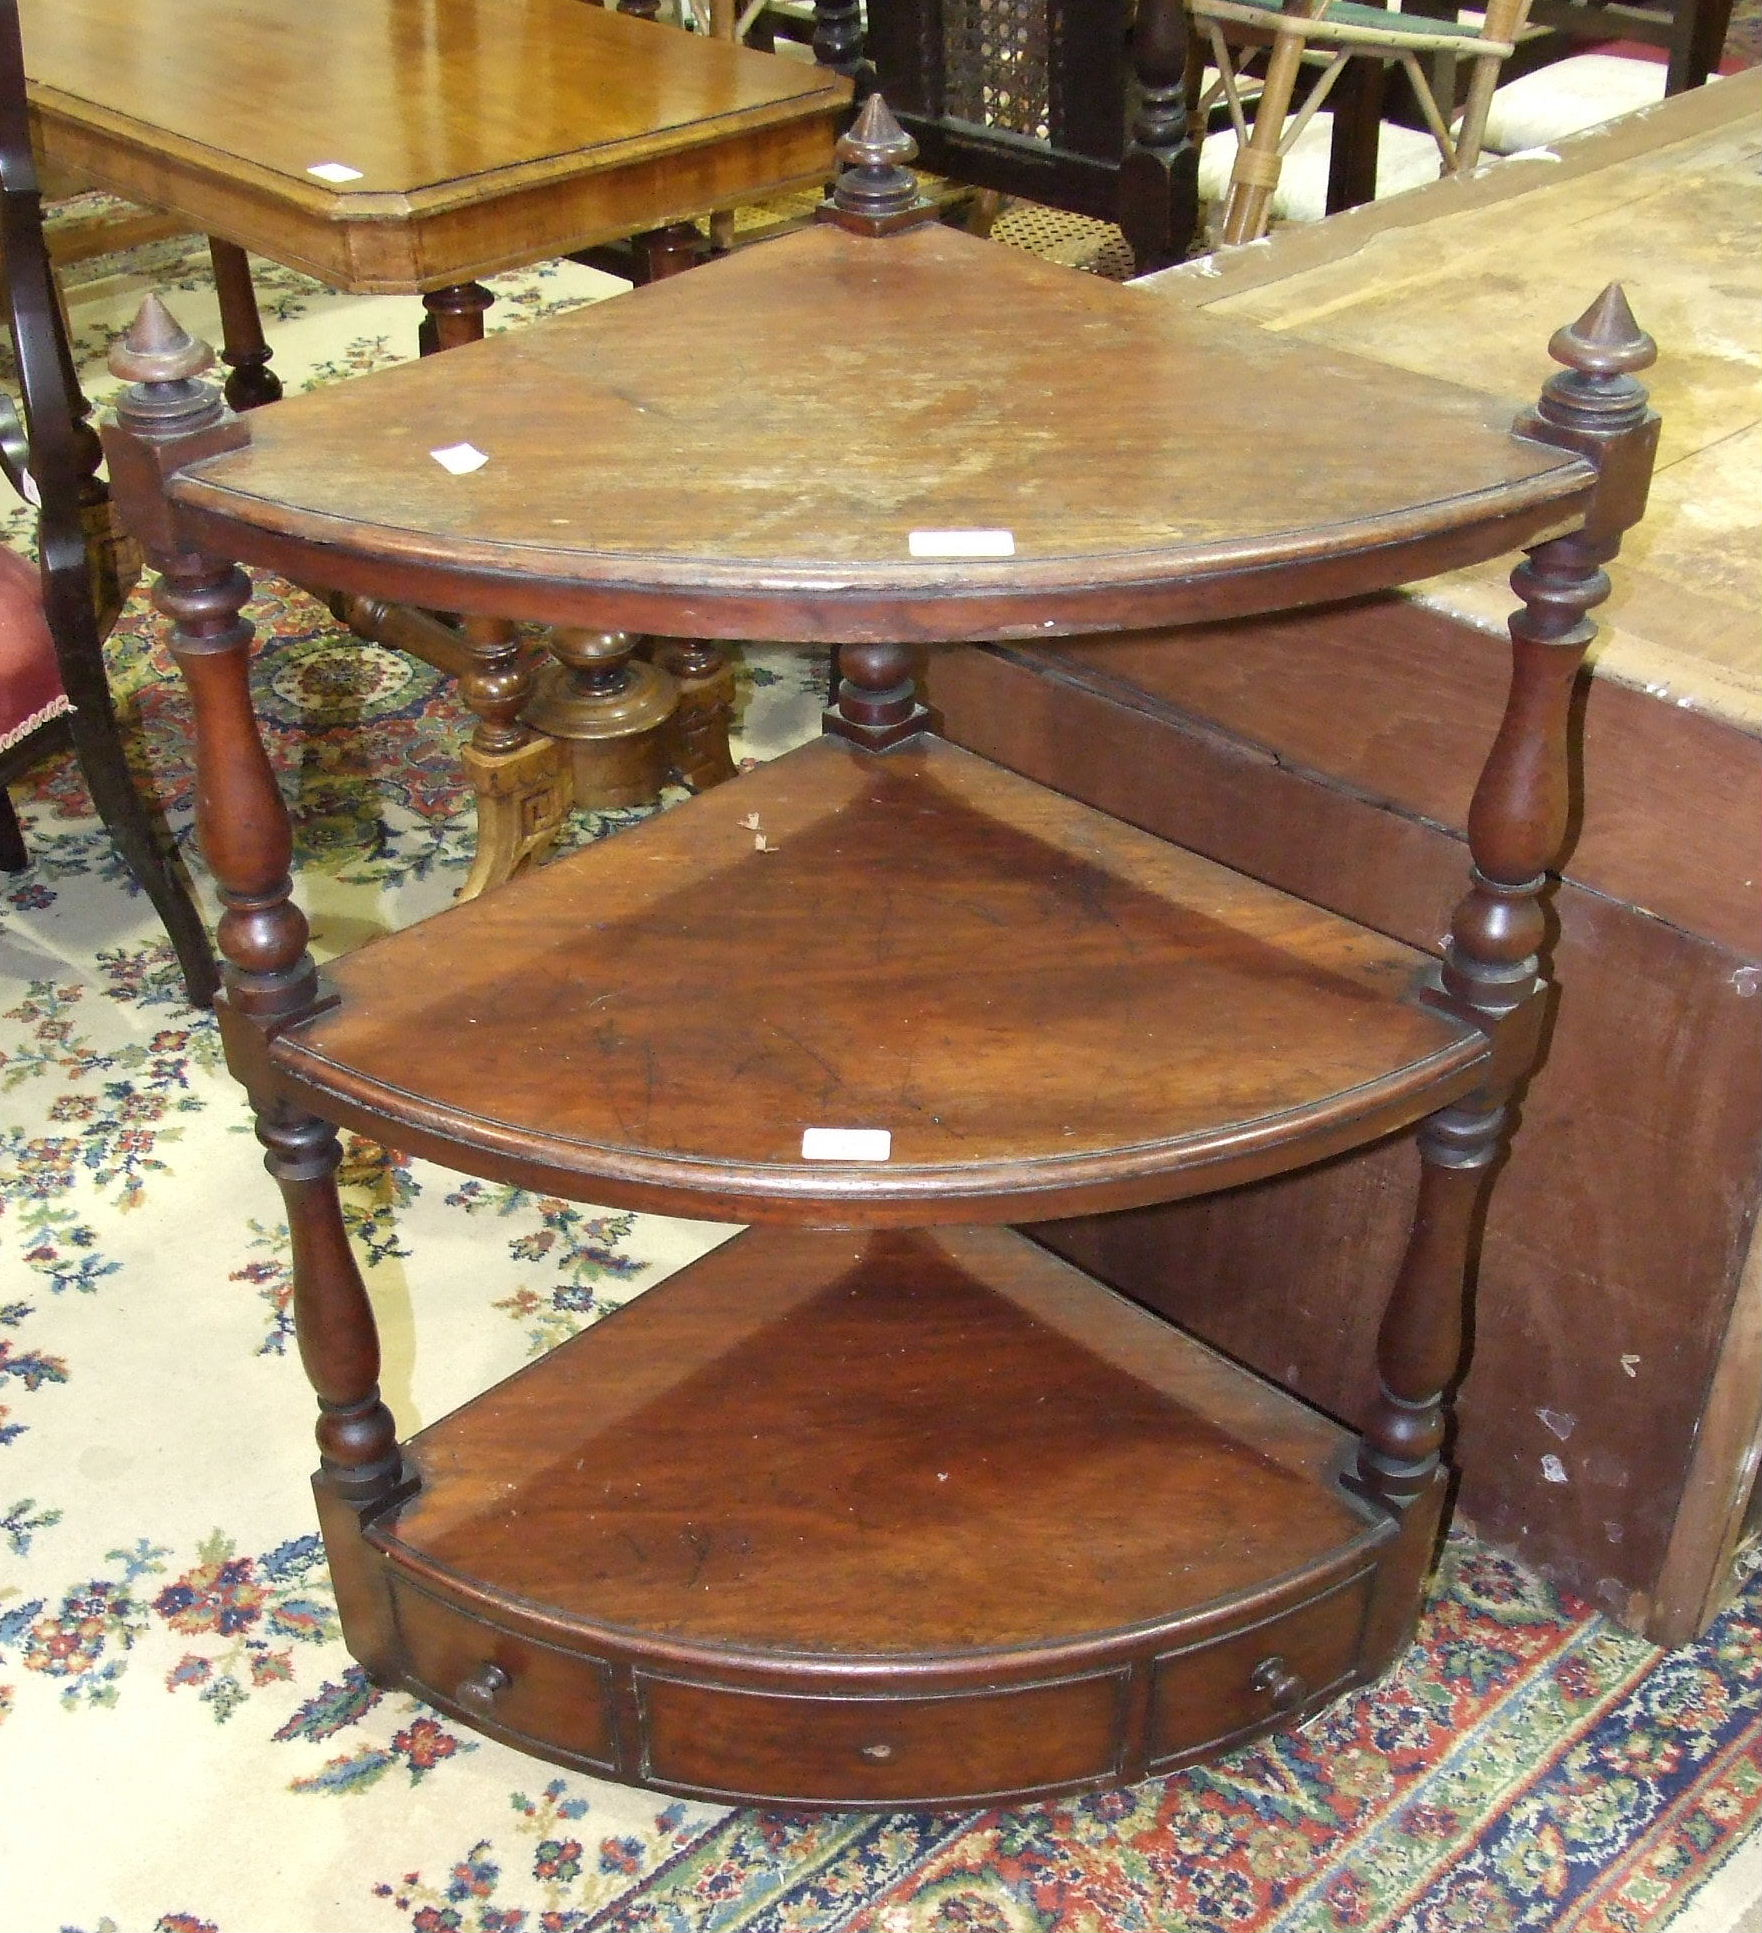 Lot 37 - A 19th century mahogany three-tier corner whatnot, 64cm wide, 85cm high.